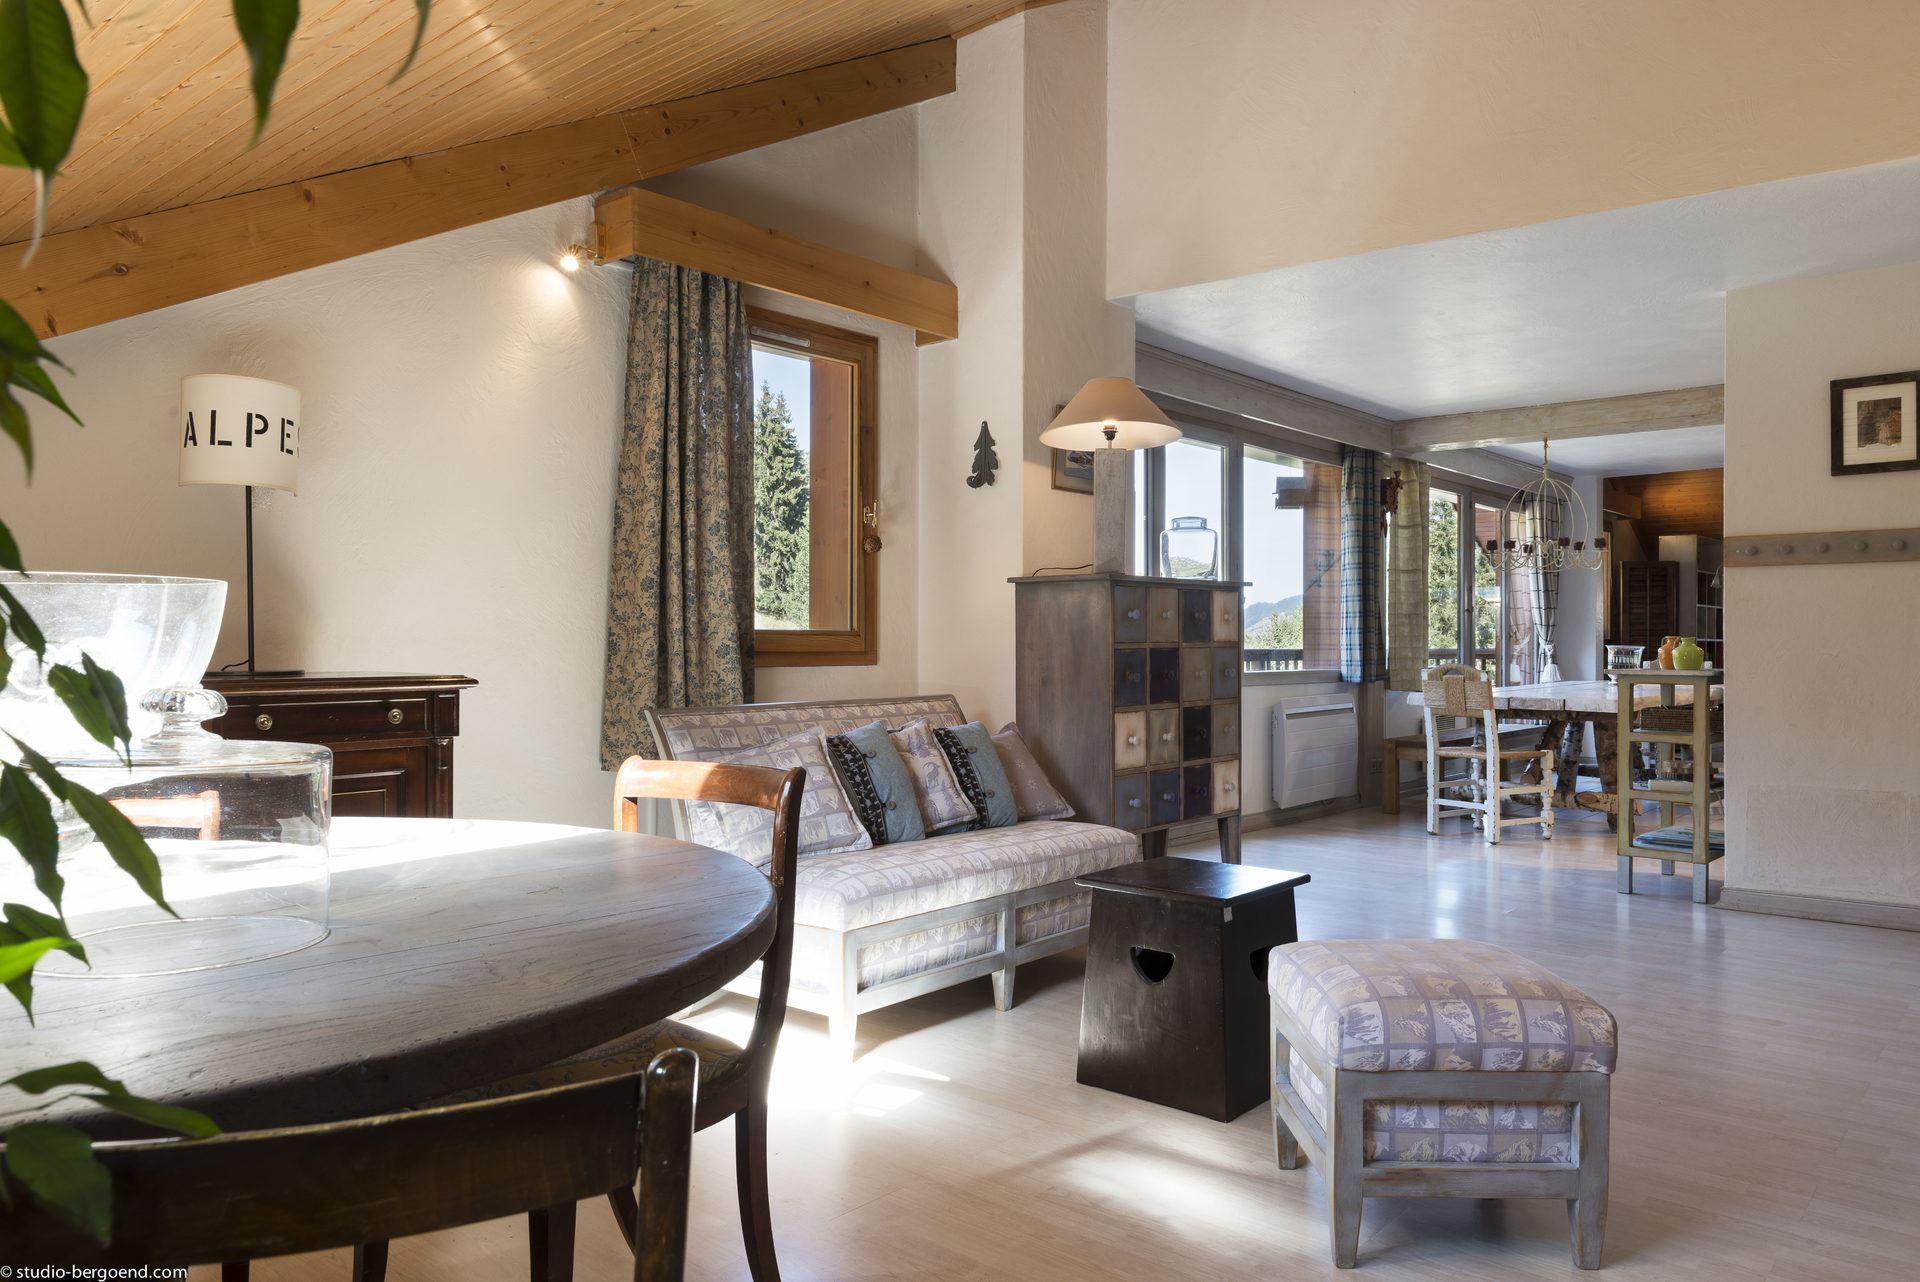 5 rooms, 10 people ski-in ski-out / Le Bois Joli (Mountain of dream)